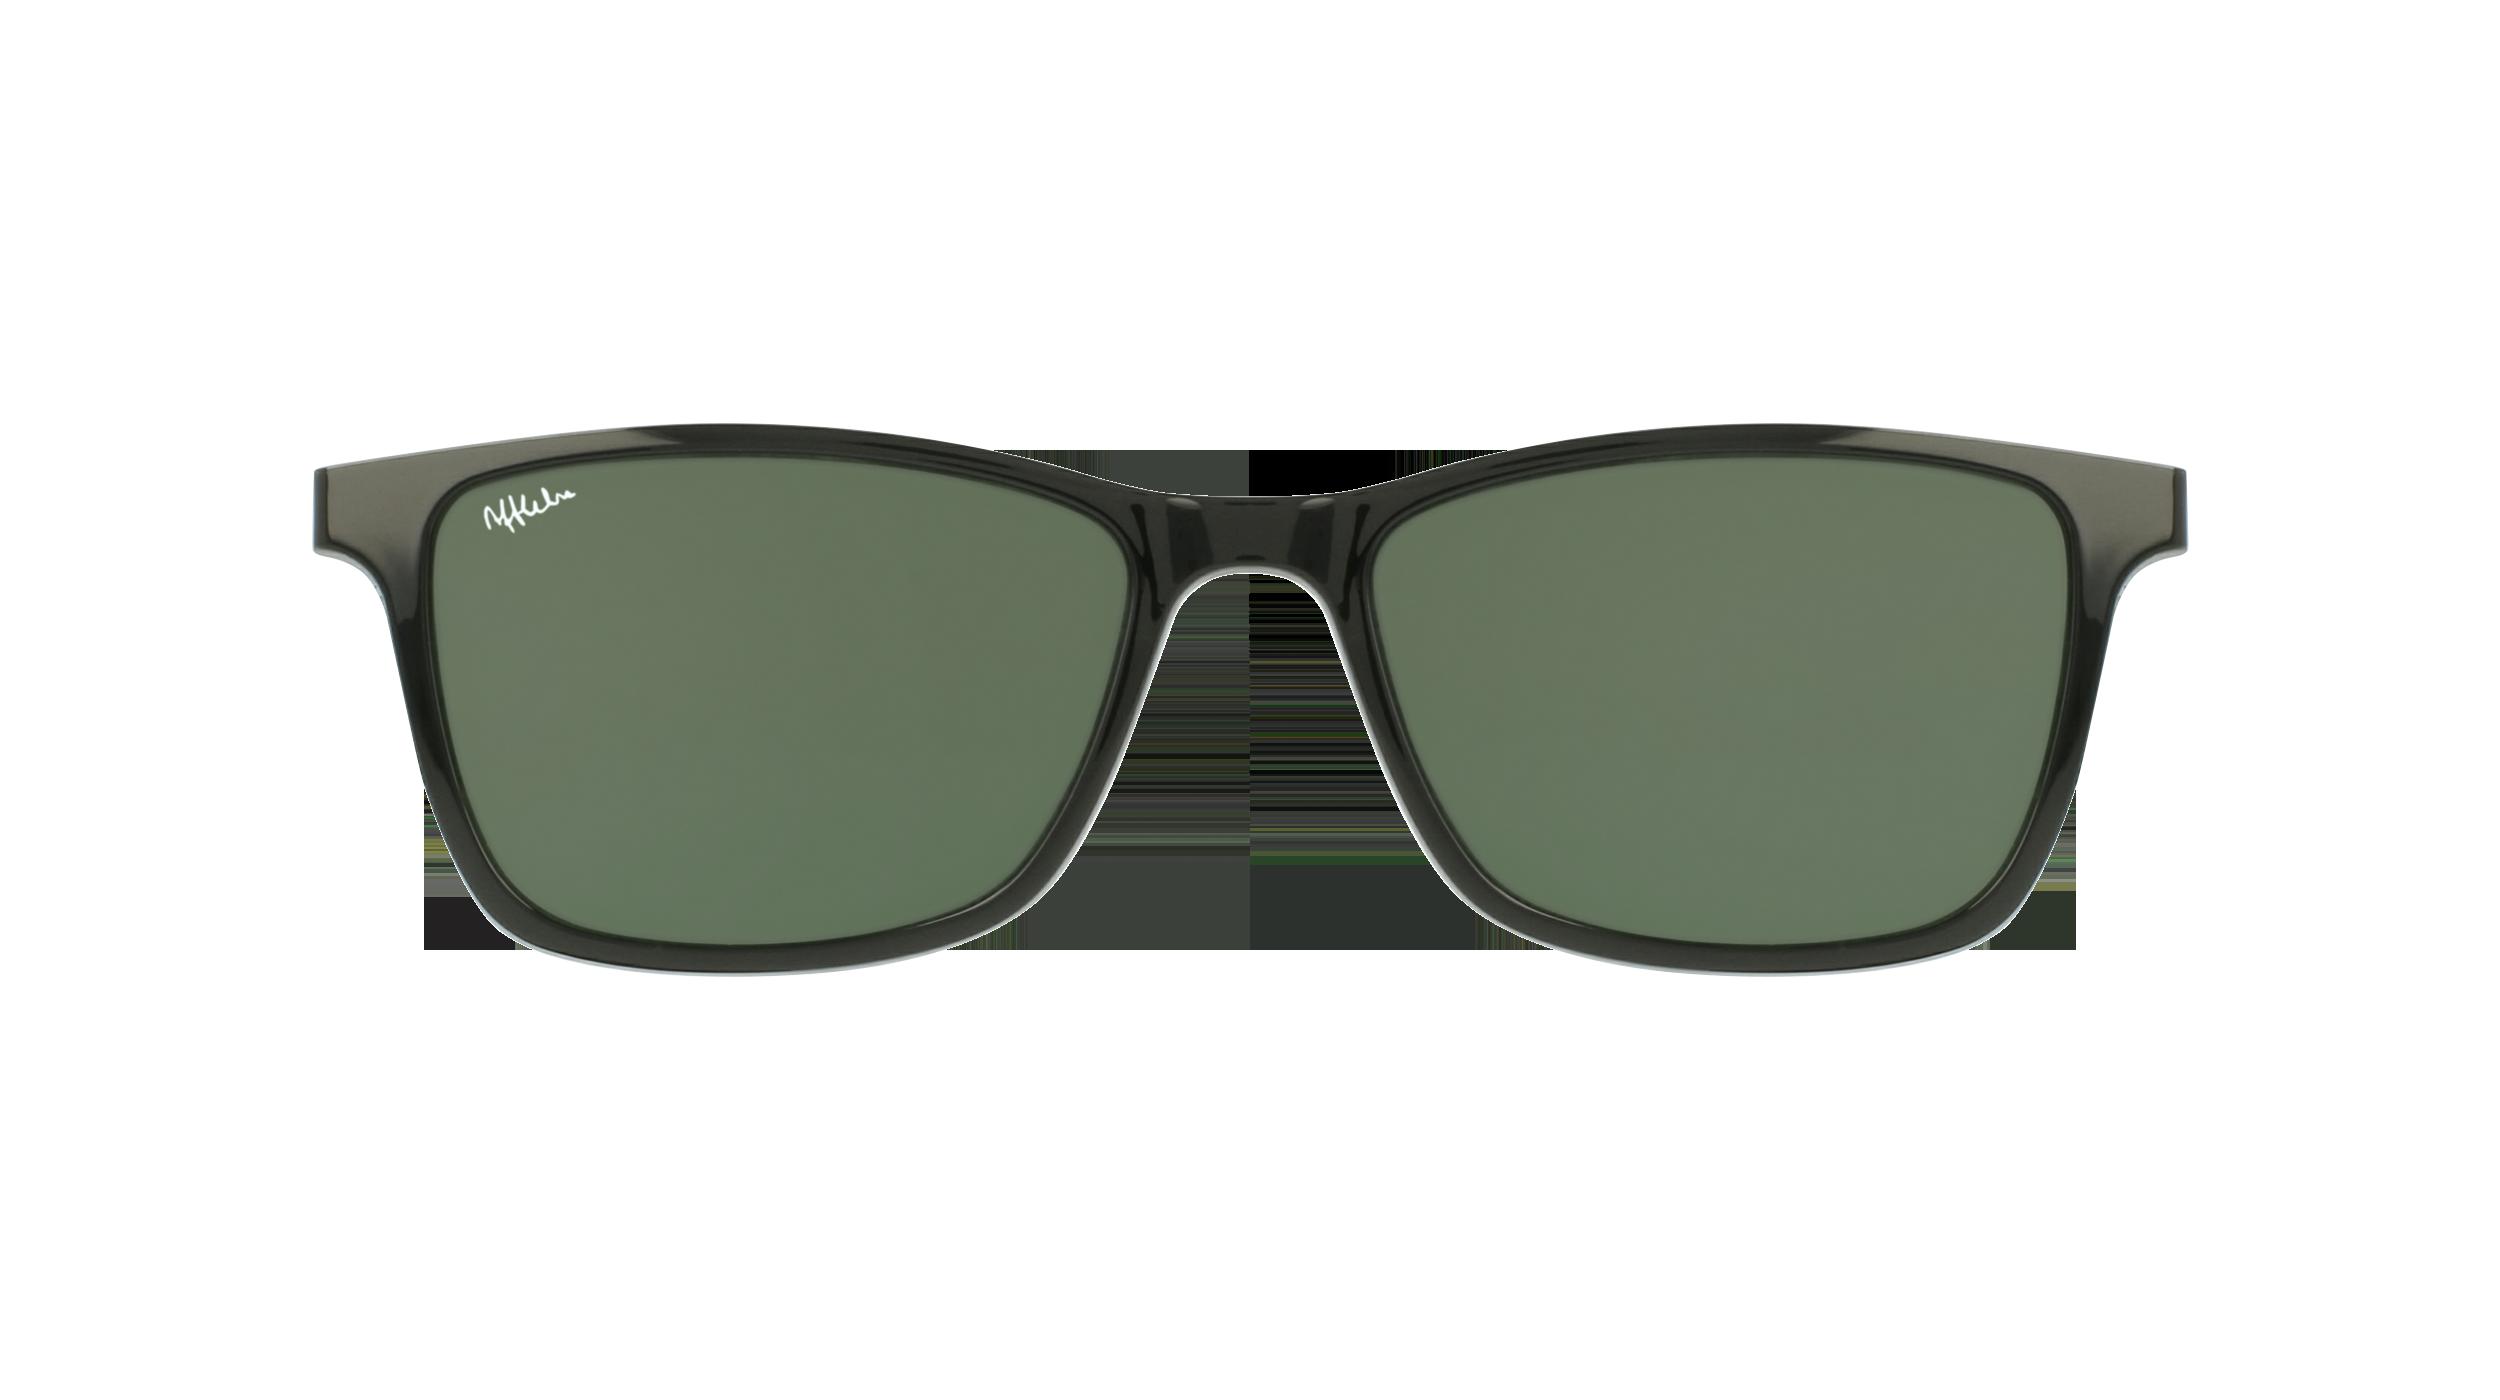 afflelou/france/products/smart_clip/clips_glasses/07630036457818.png